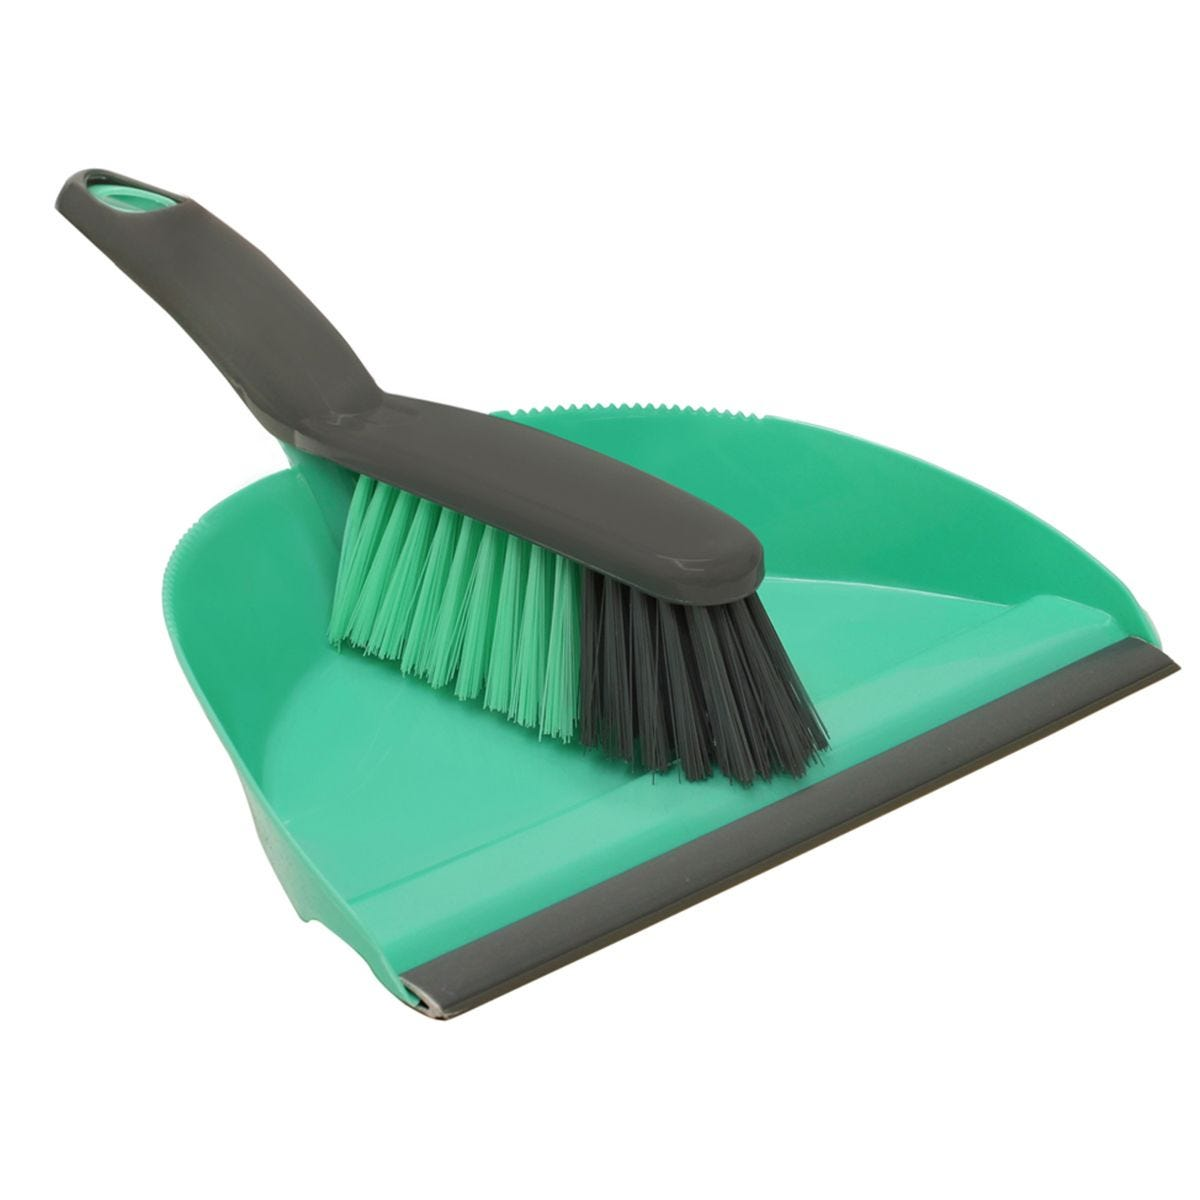 JVL Dustpan and Bristle Brush Set Turquoise/Grey